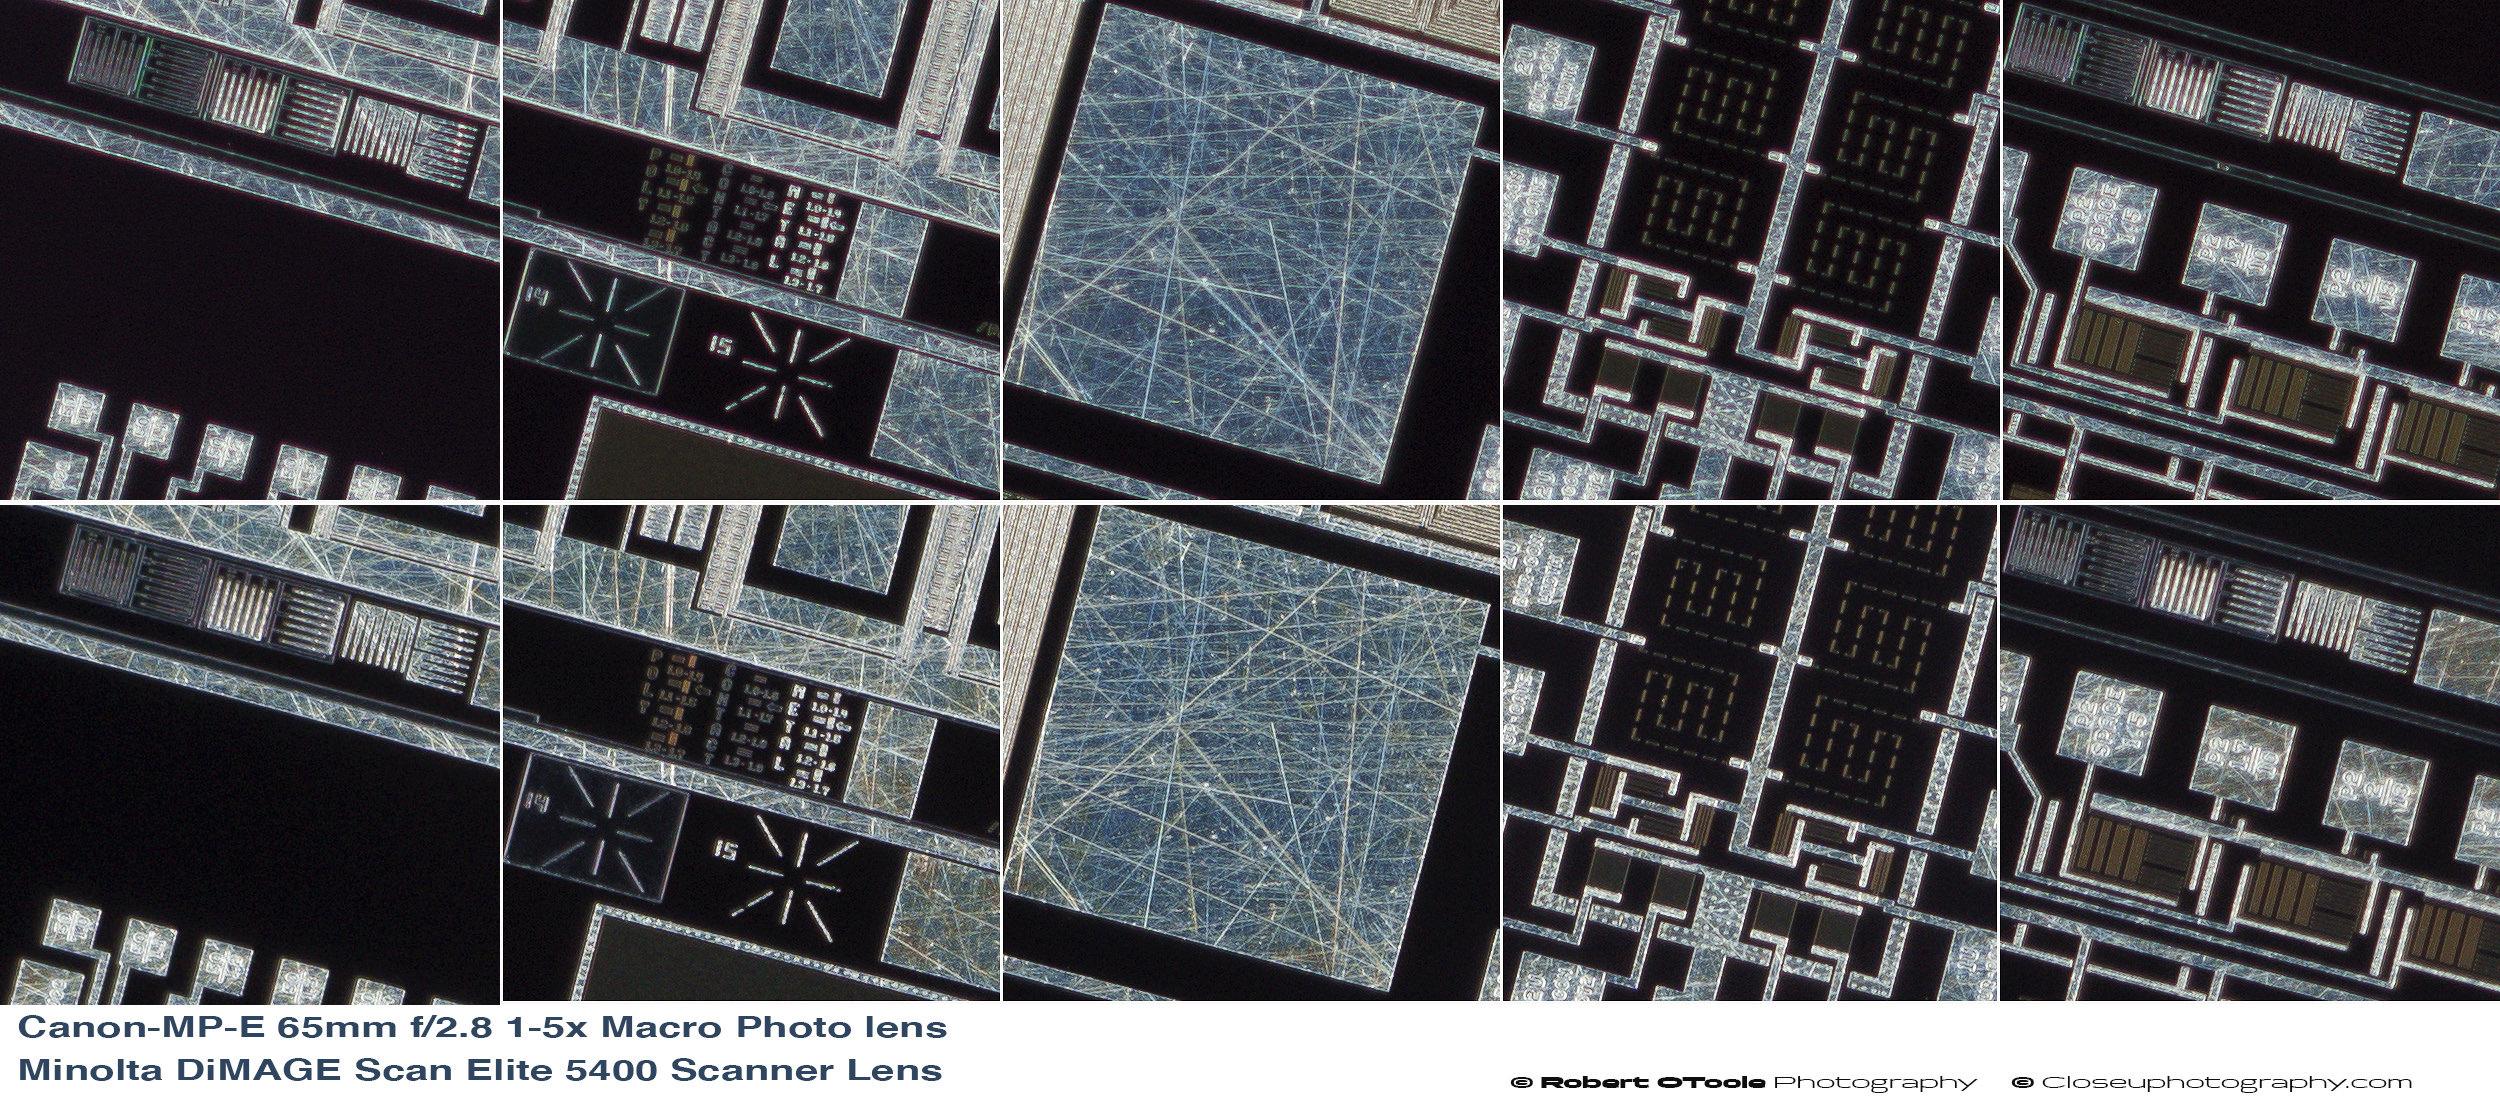 Canon-MP-E-65mm-f2.8-1-5x-Macro-Photo-lens-vs-Minolta-DiMAGE-Scan-Elite-5400-Scanner-Lens-100-percent-crops.jpg